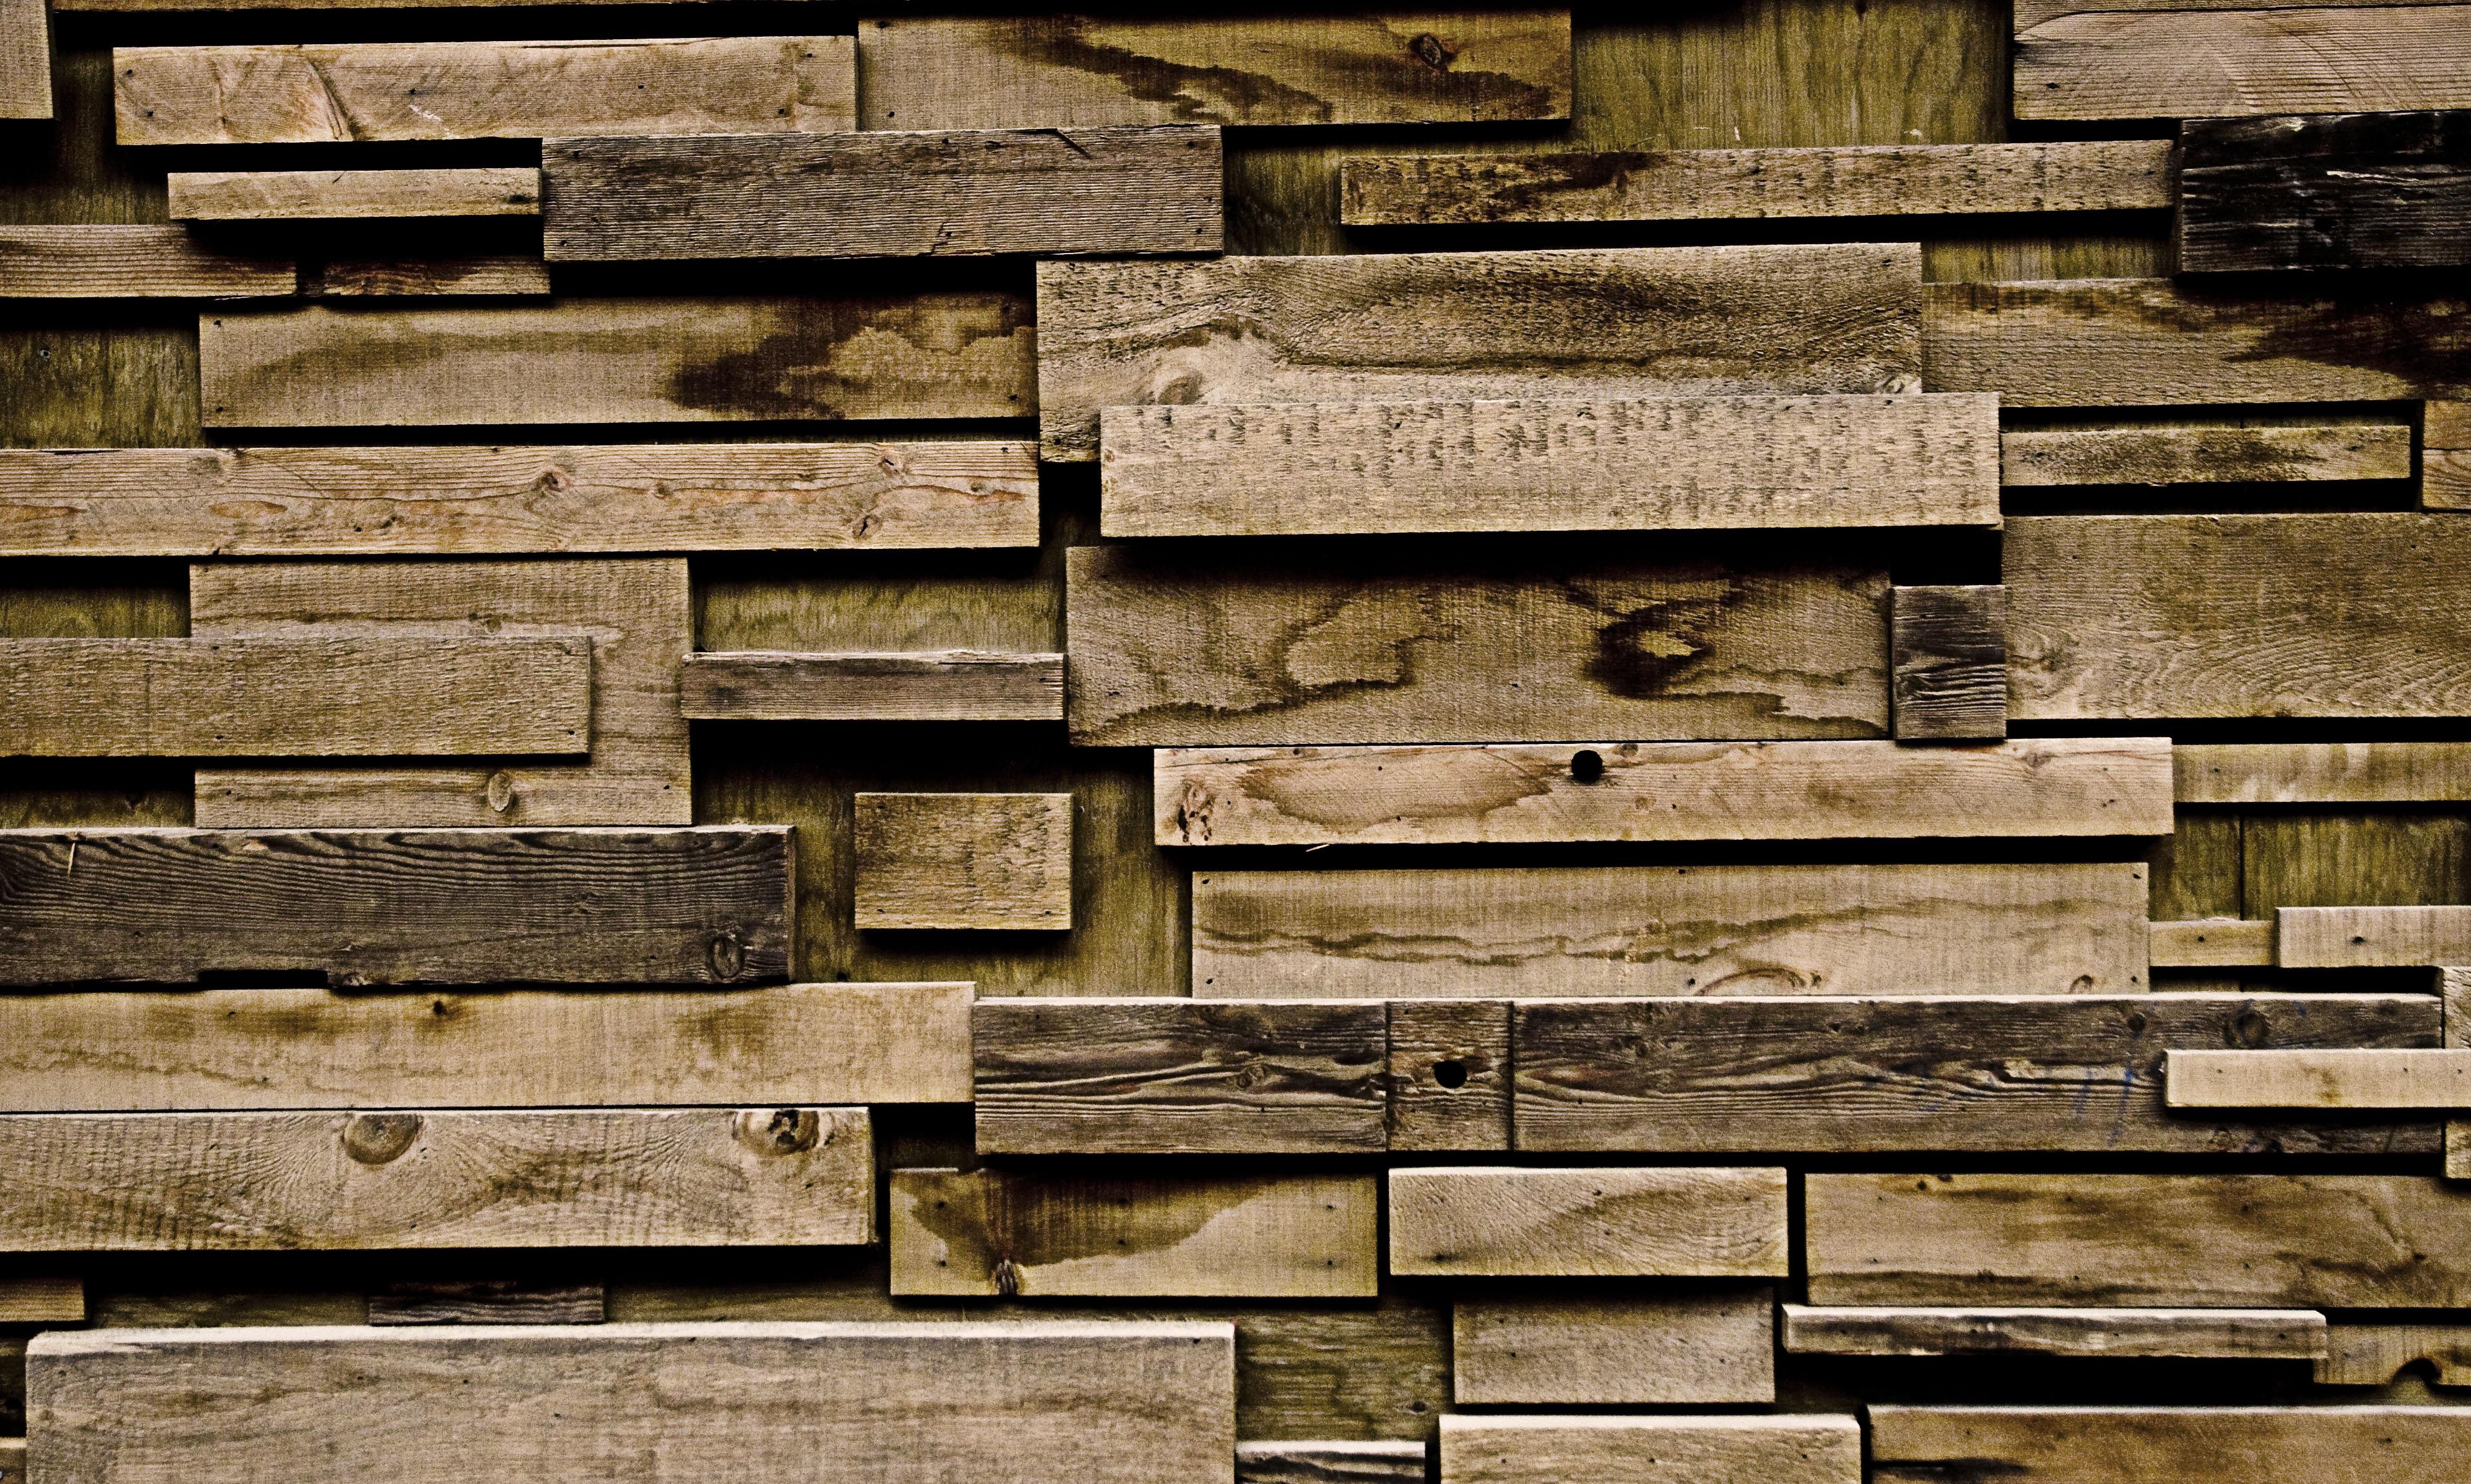 Shelf Wallpaper Iphone 画像 シンプルな木目の壁紙 Naver まとめ